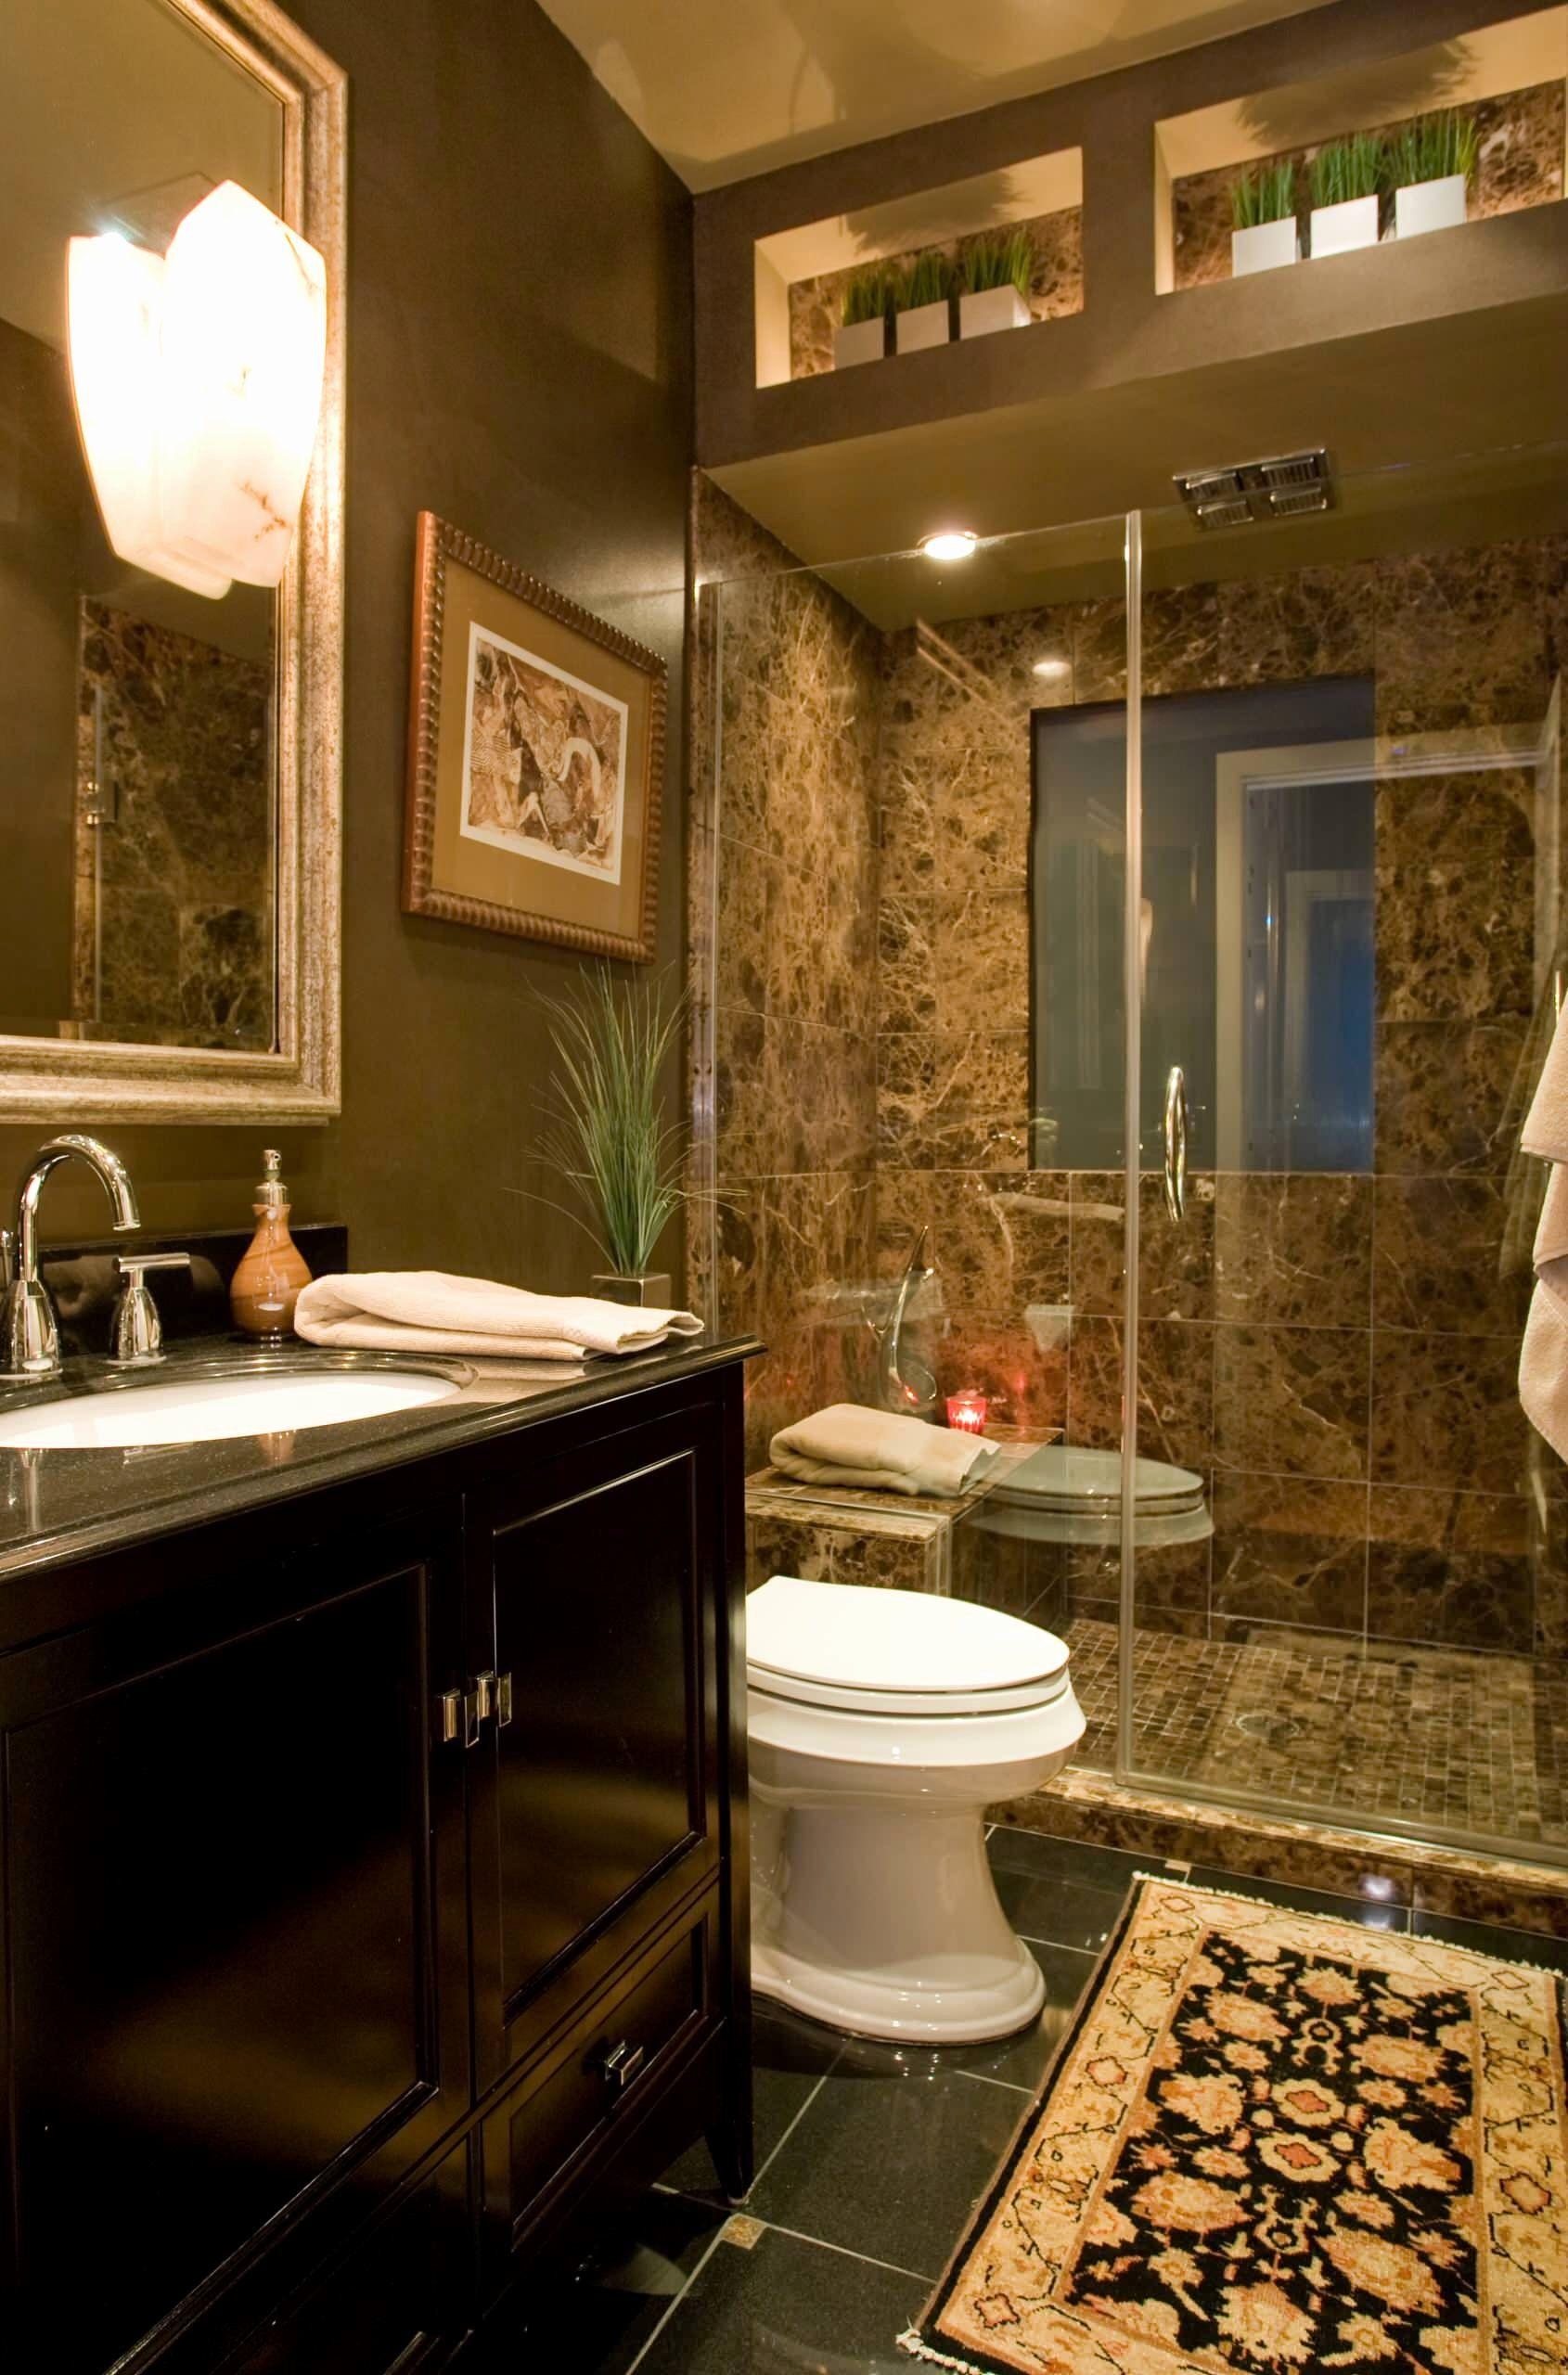 5x9 Bathroom Layout - HOME DECOR